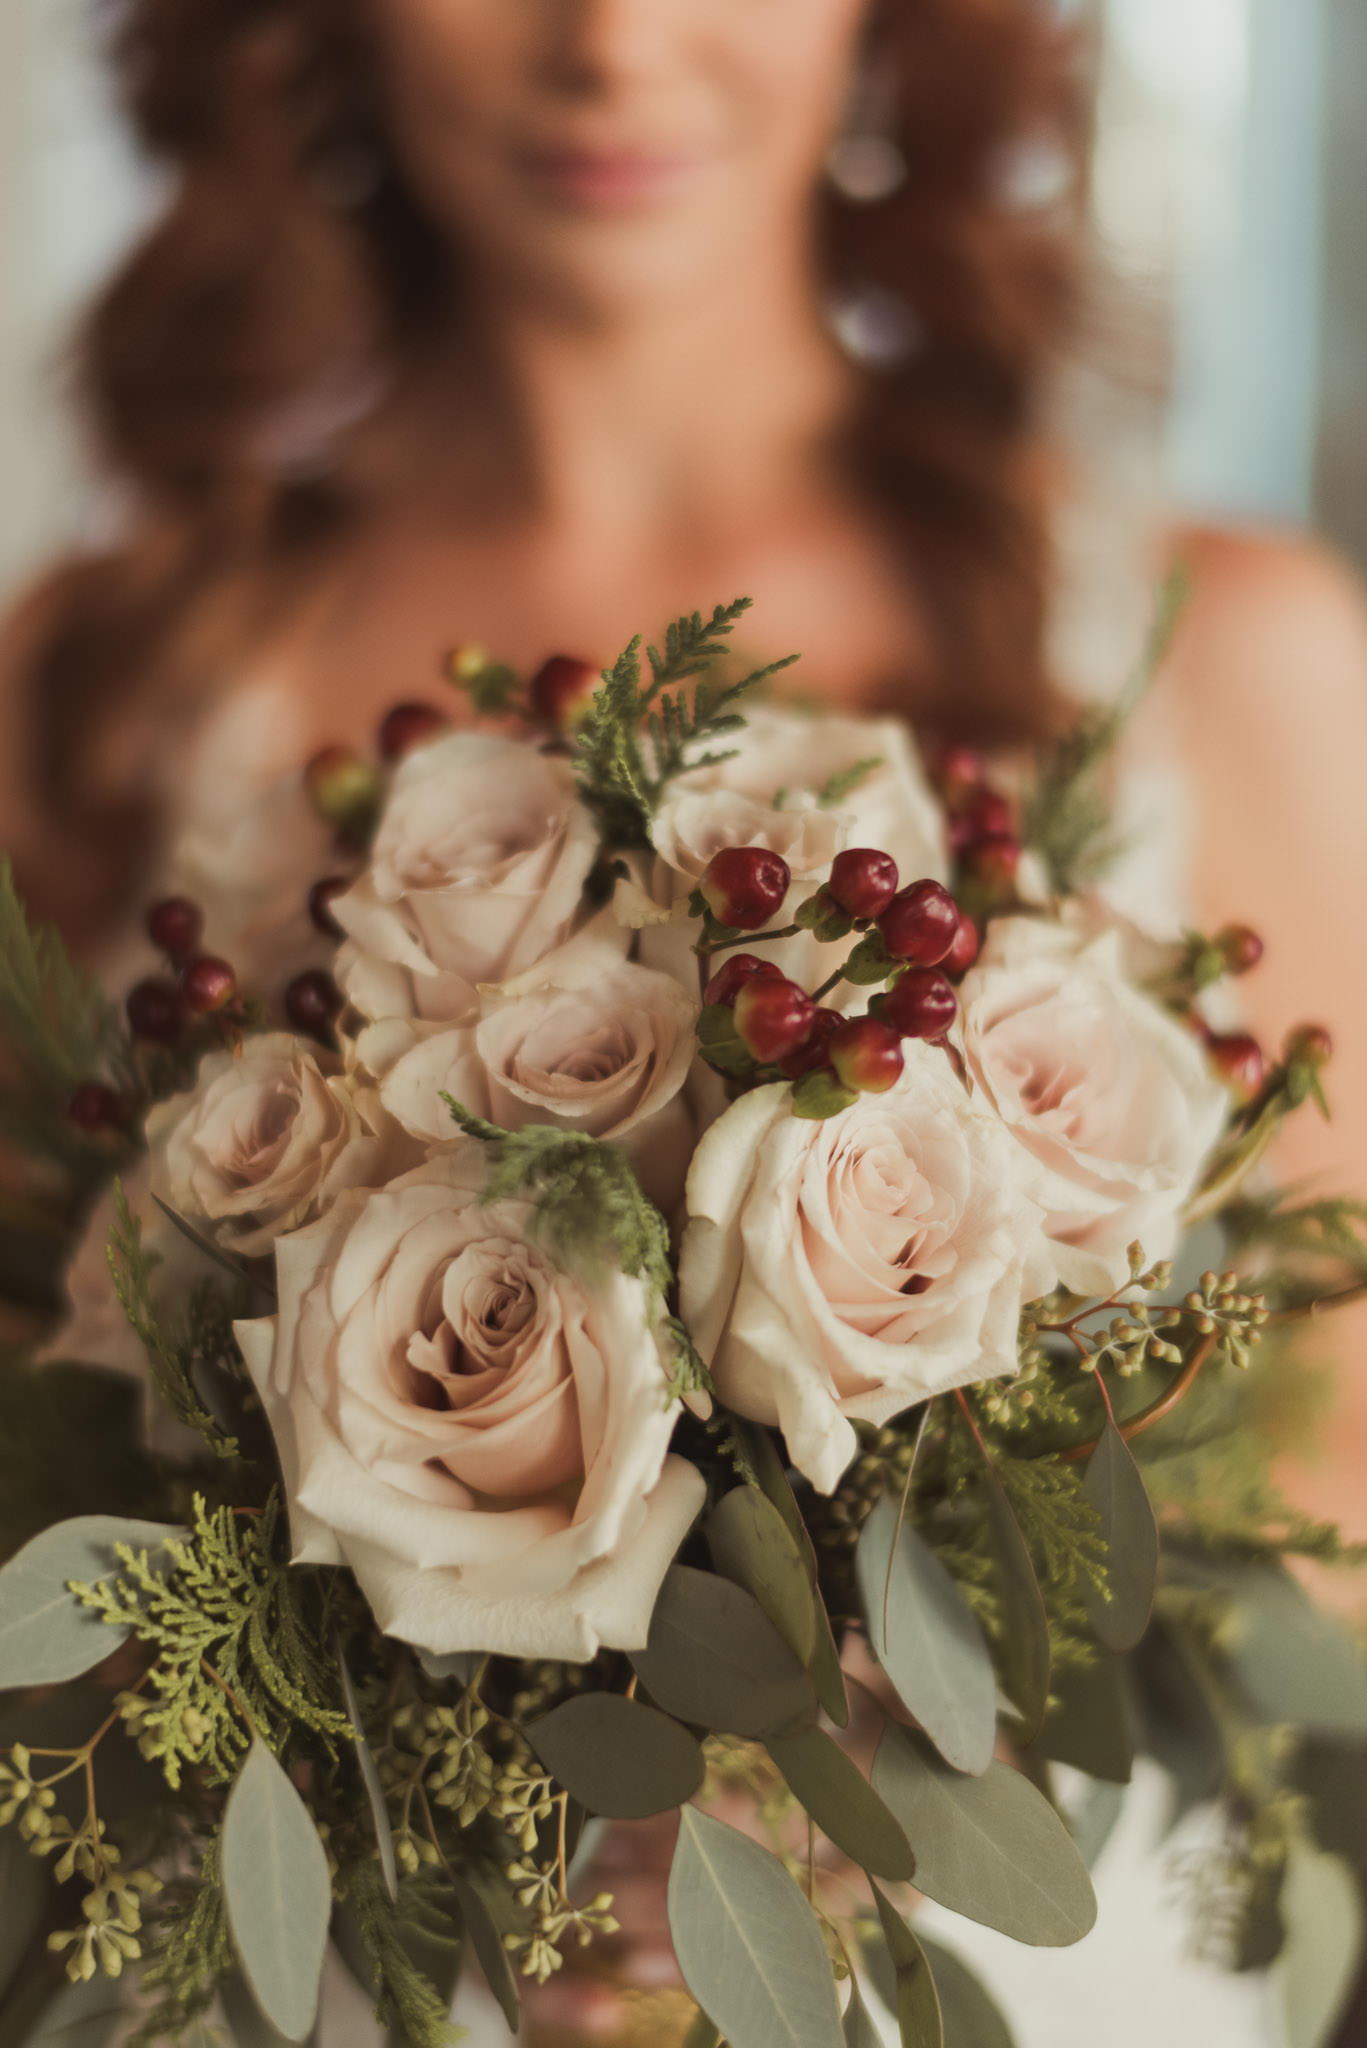 Cynthia-Curtis-Olde-Dobbine-Station-Houston-Wedding-Photographer-sm-40.jpg